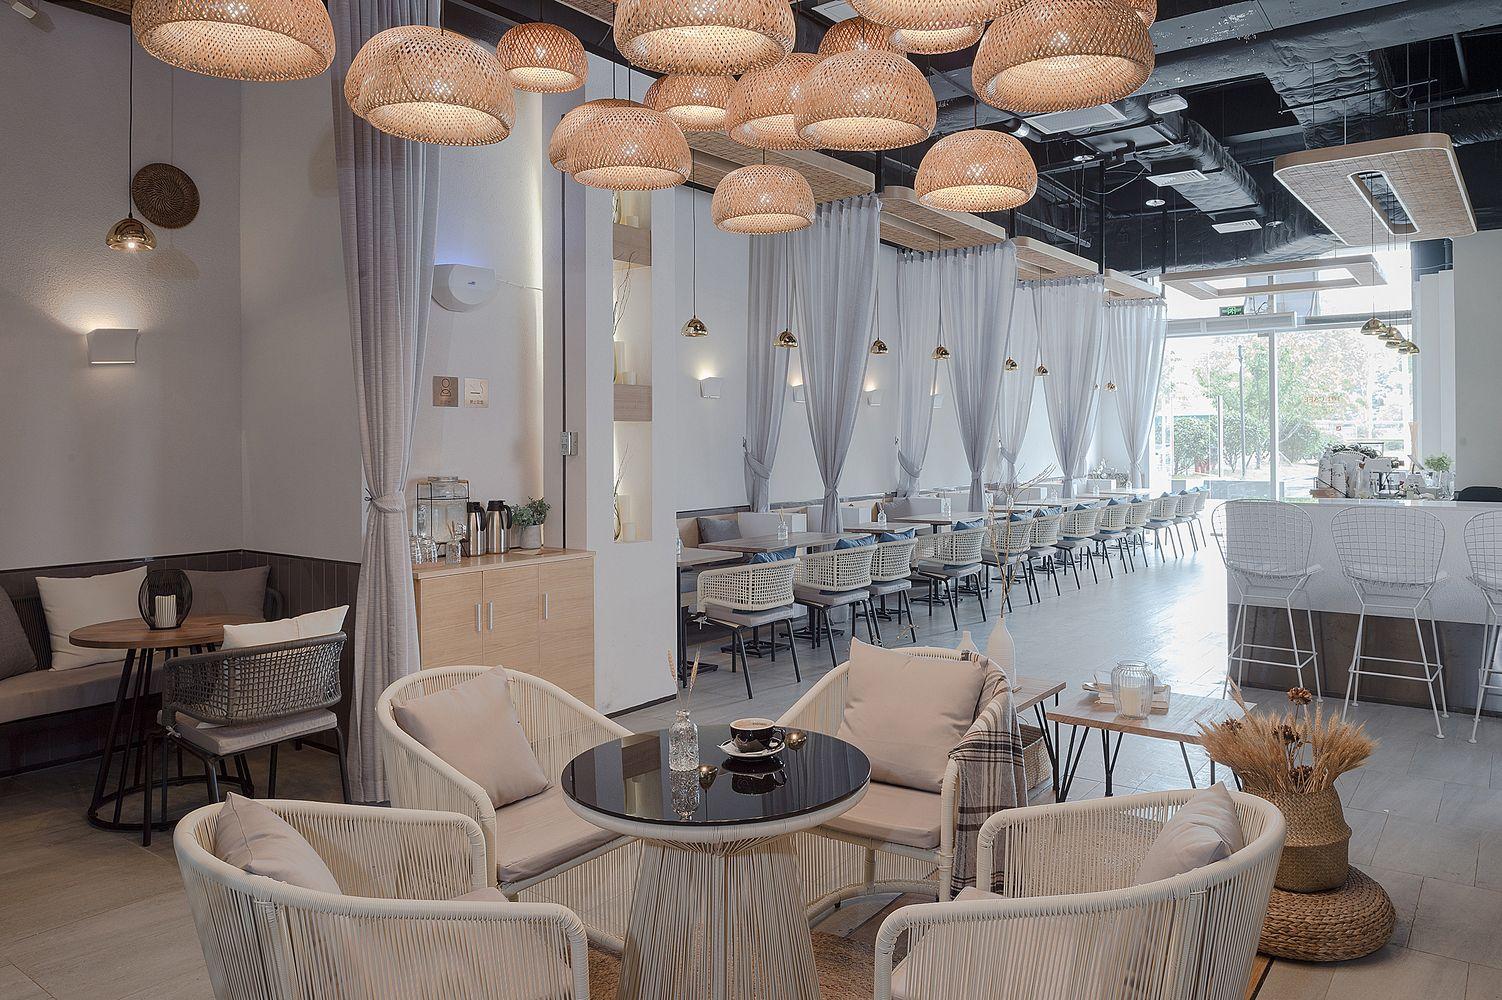 Galería de café far office curtain divider modern